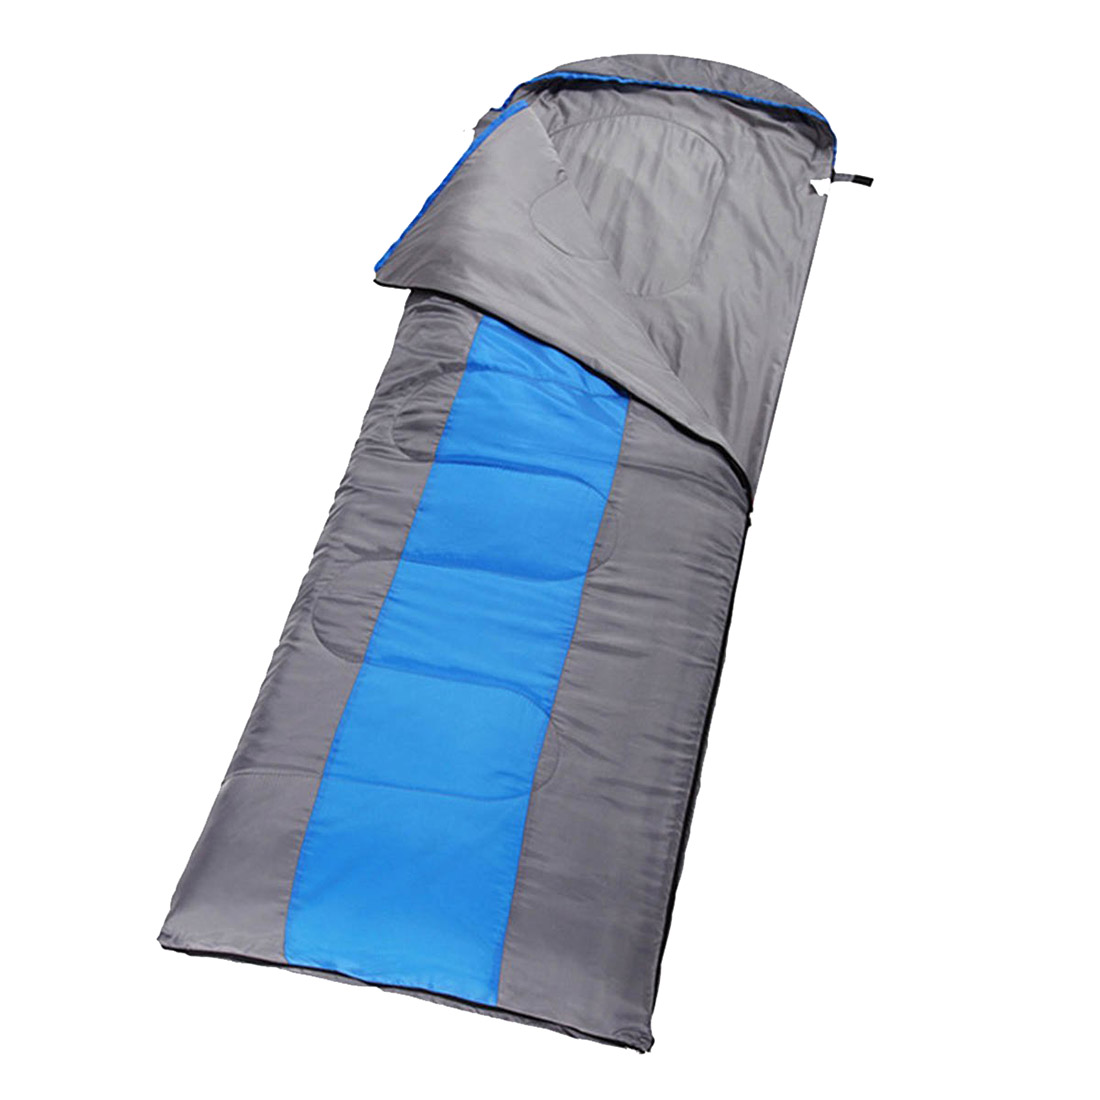 AOTU Outdoor Portable Ultralight Sleeping Sports